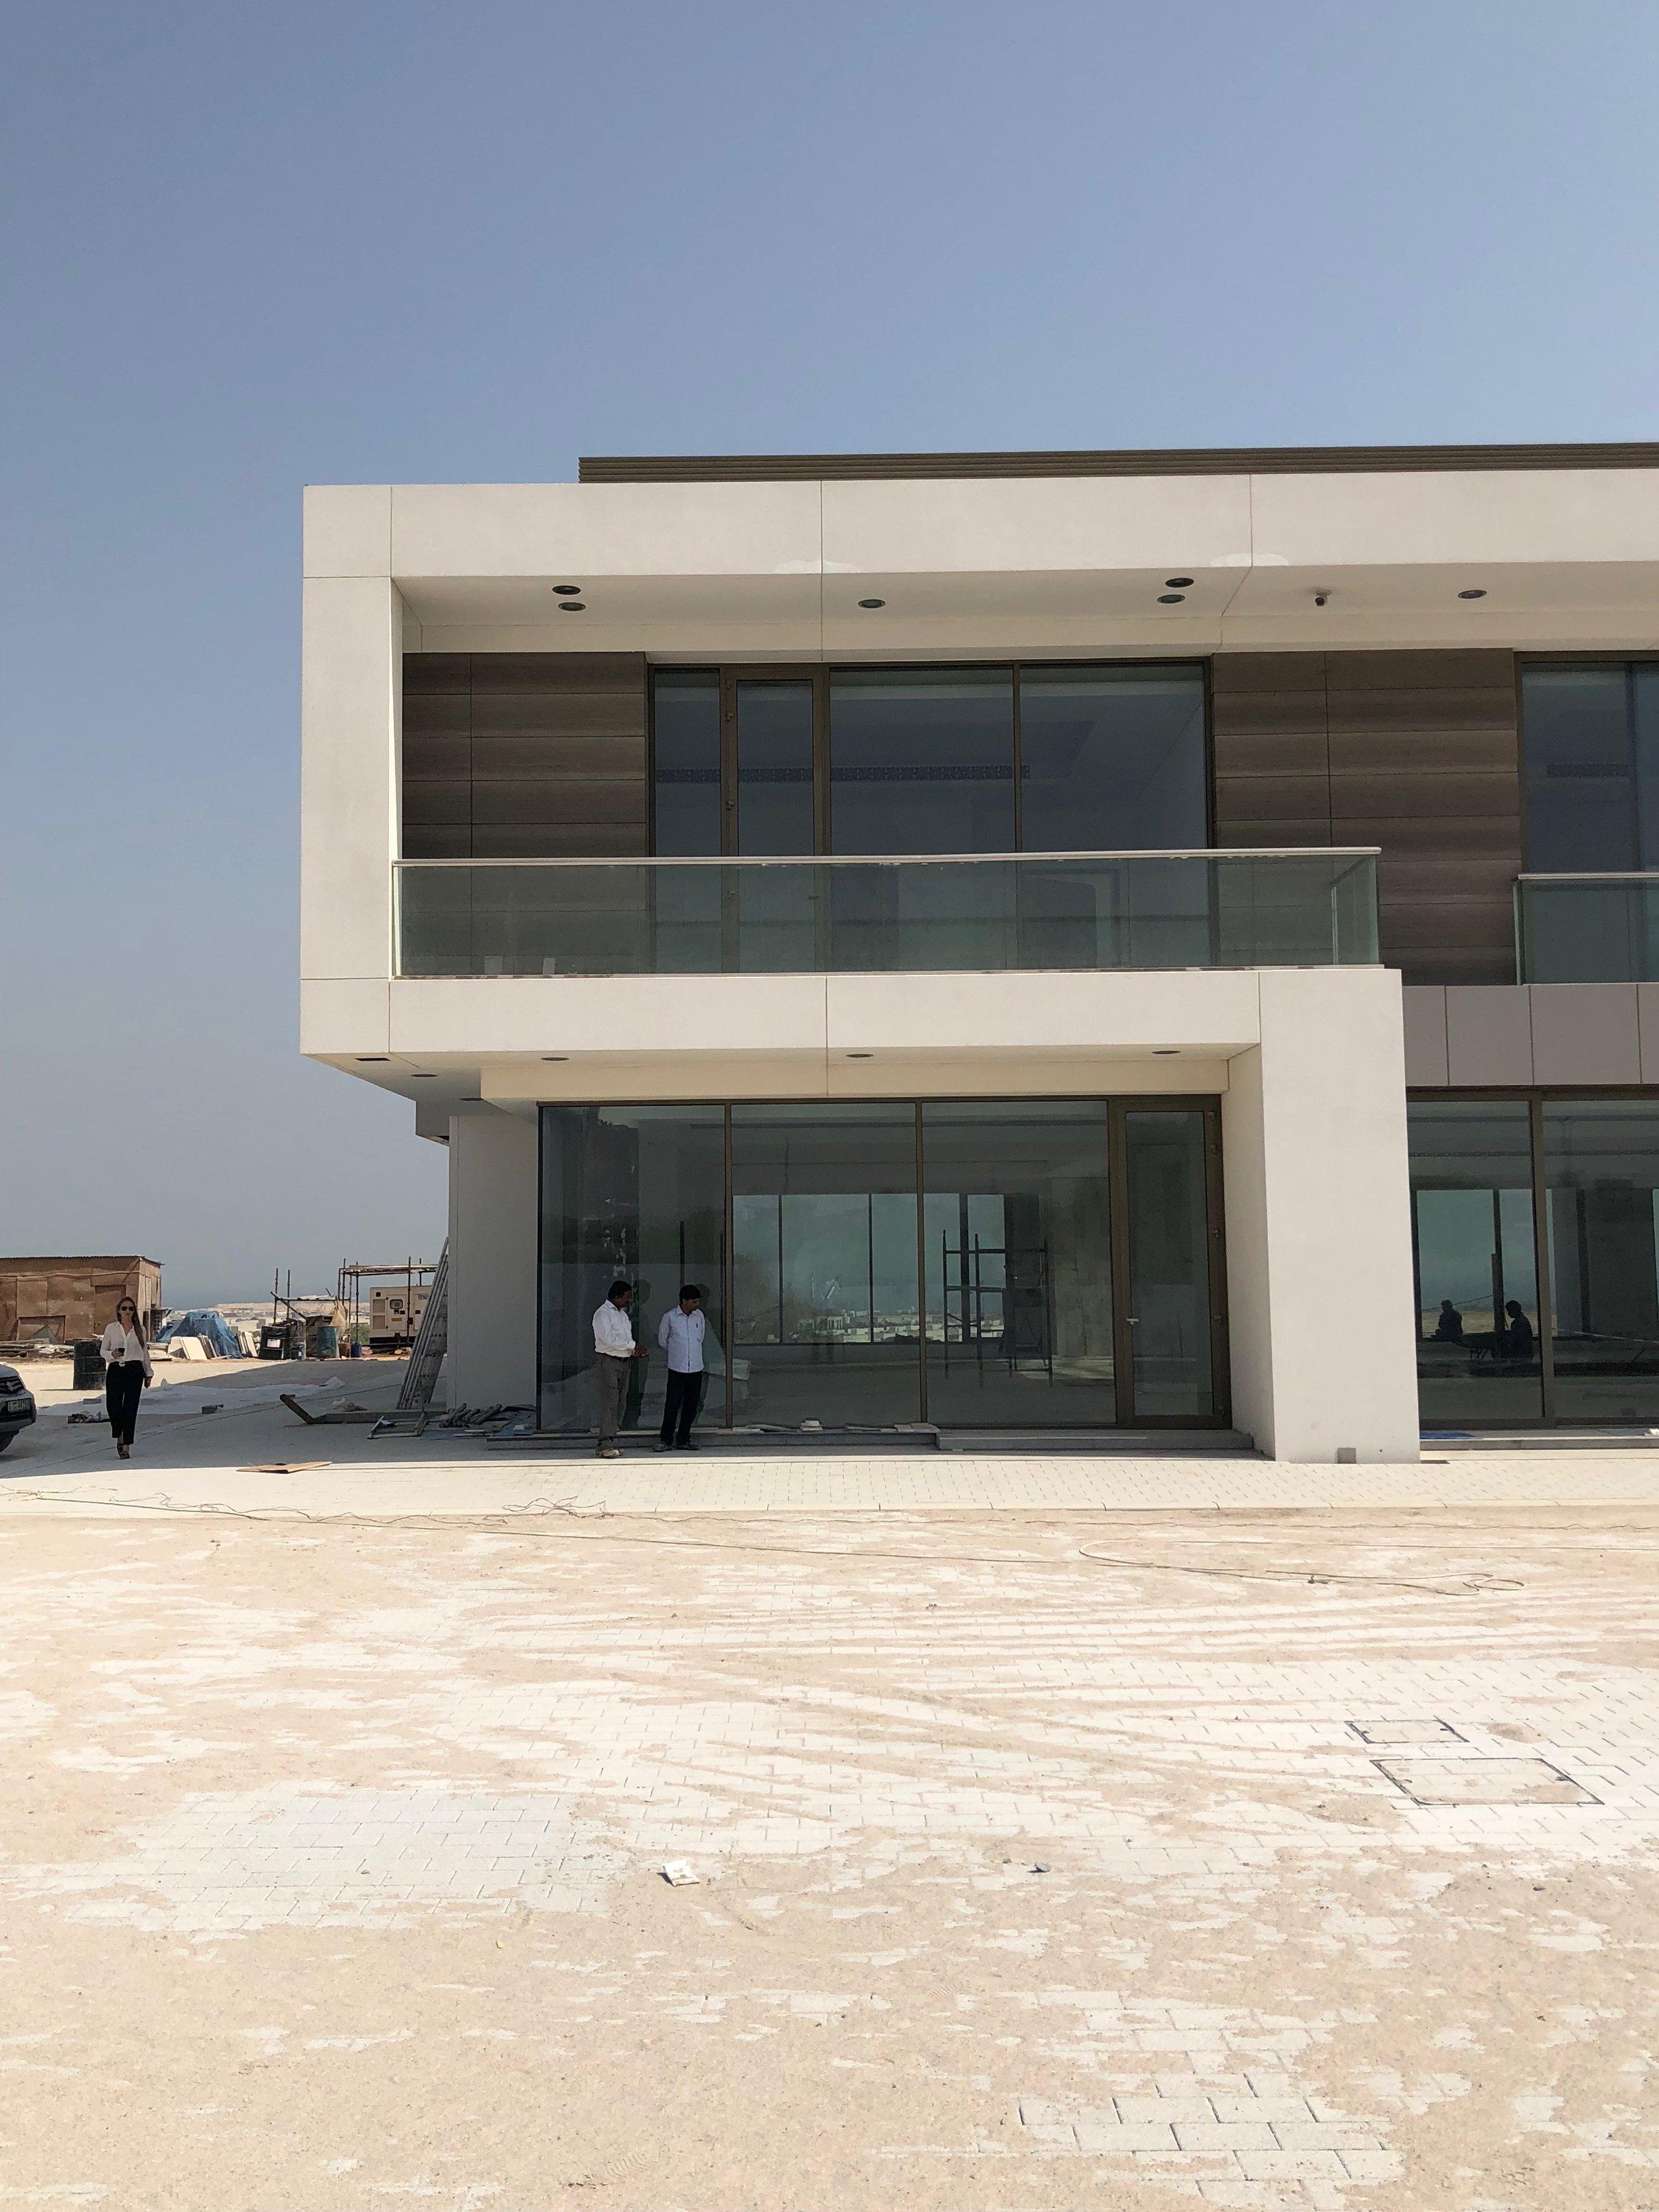 BEACH VILLA - RAS AL KHAIMA - UAE